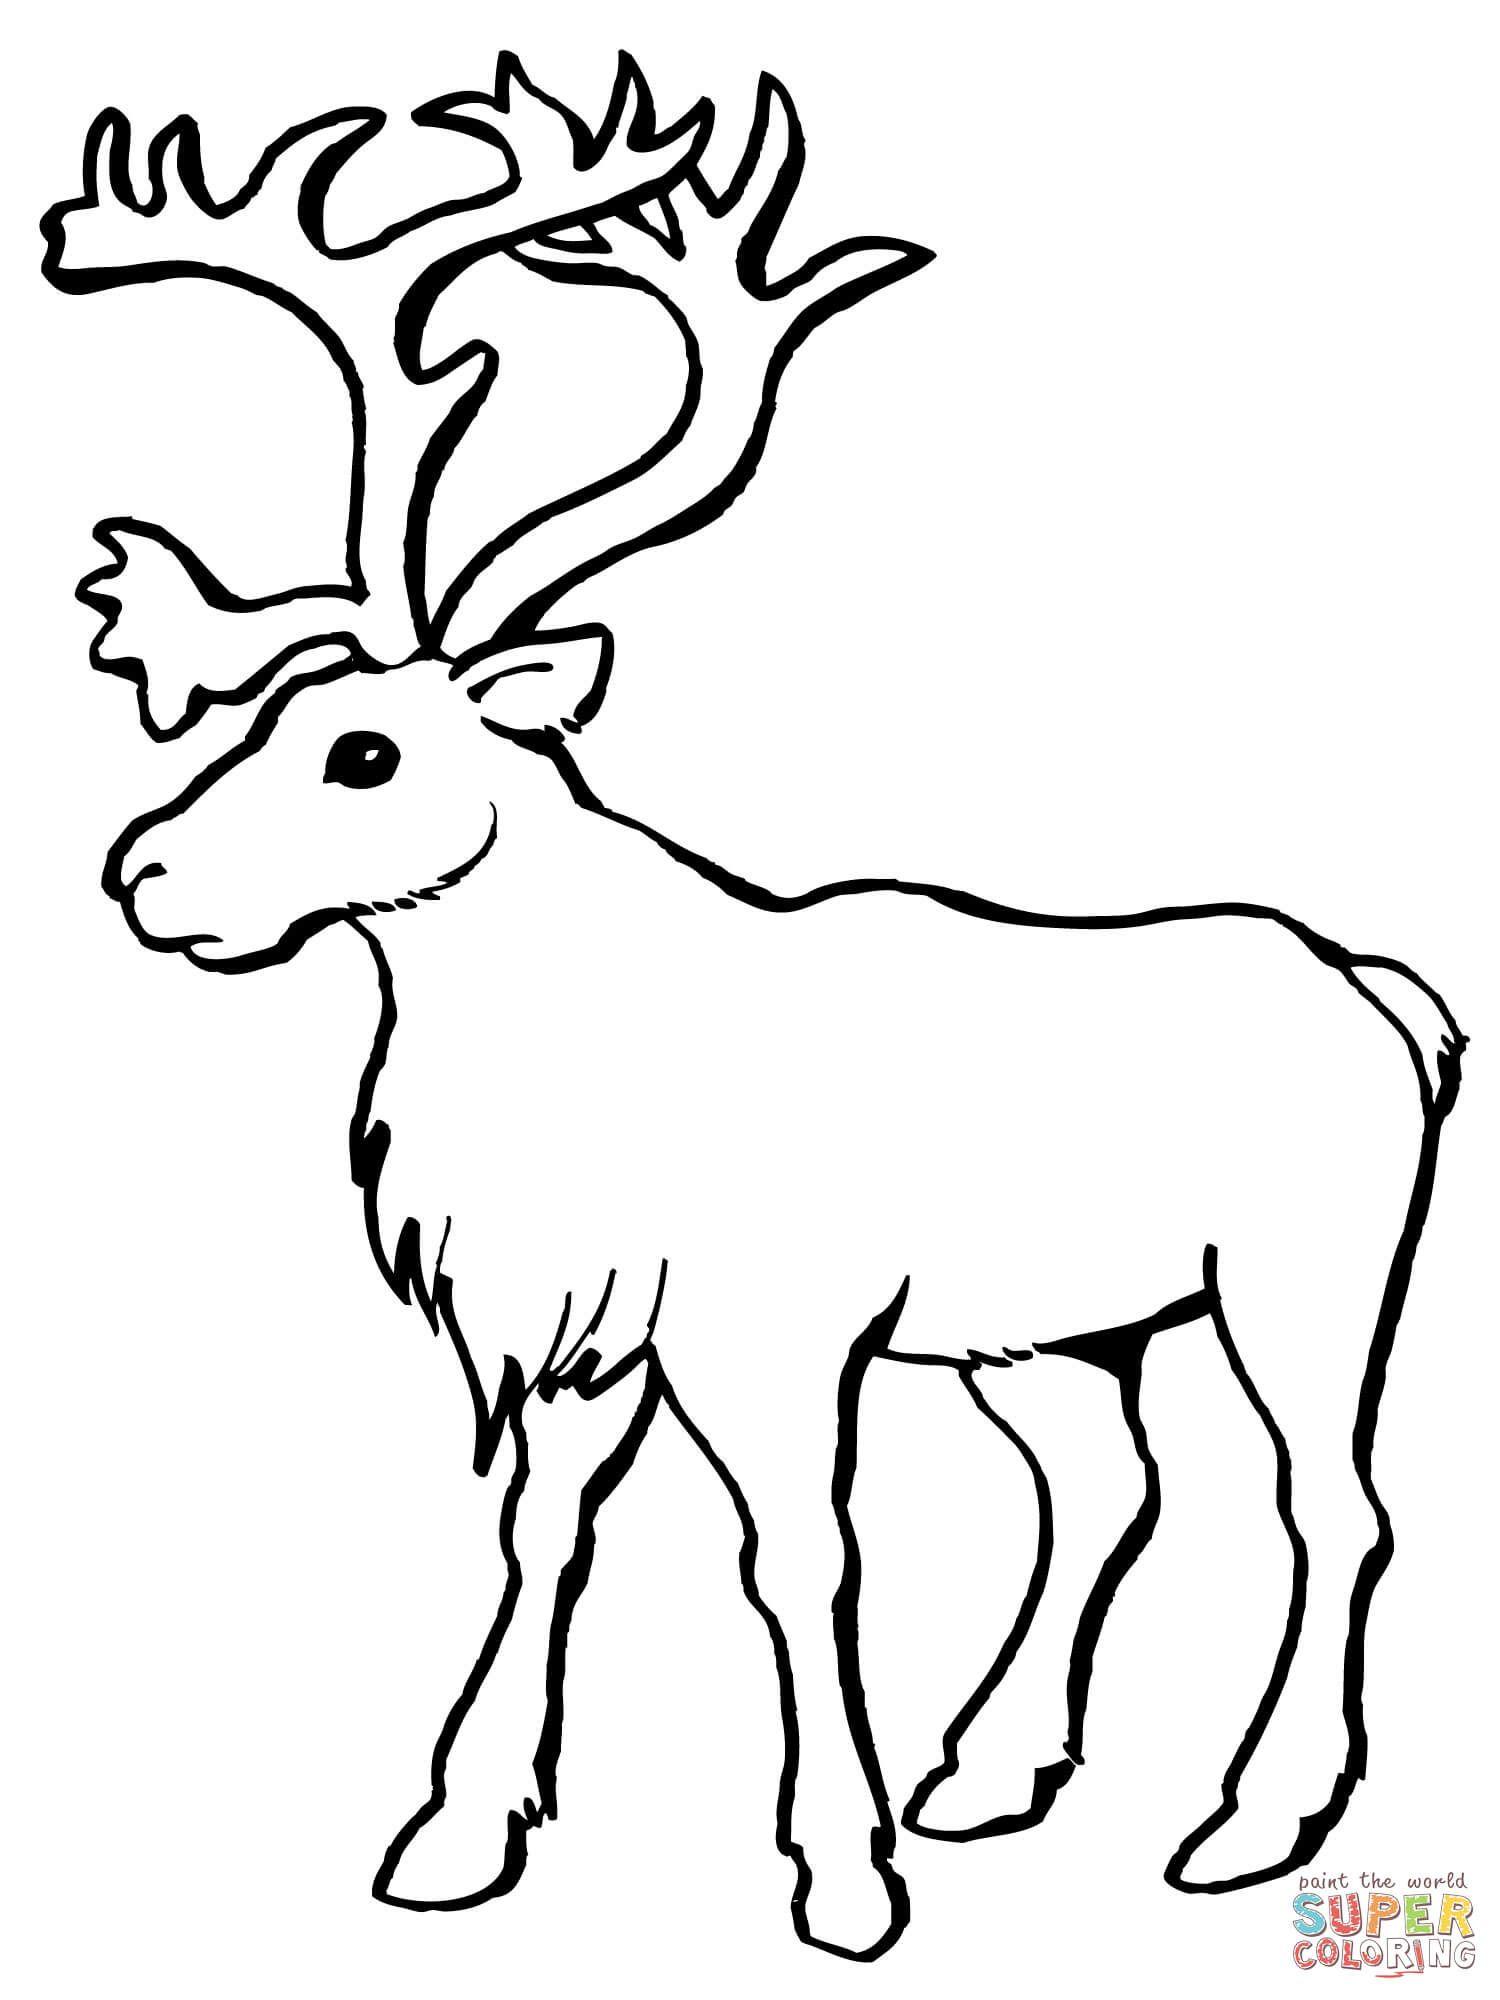 Reindeer Caribou Coloring Page | Free Printable Coloring avec Caribou Dessin